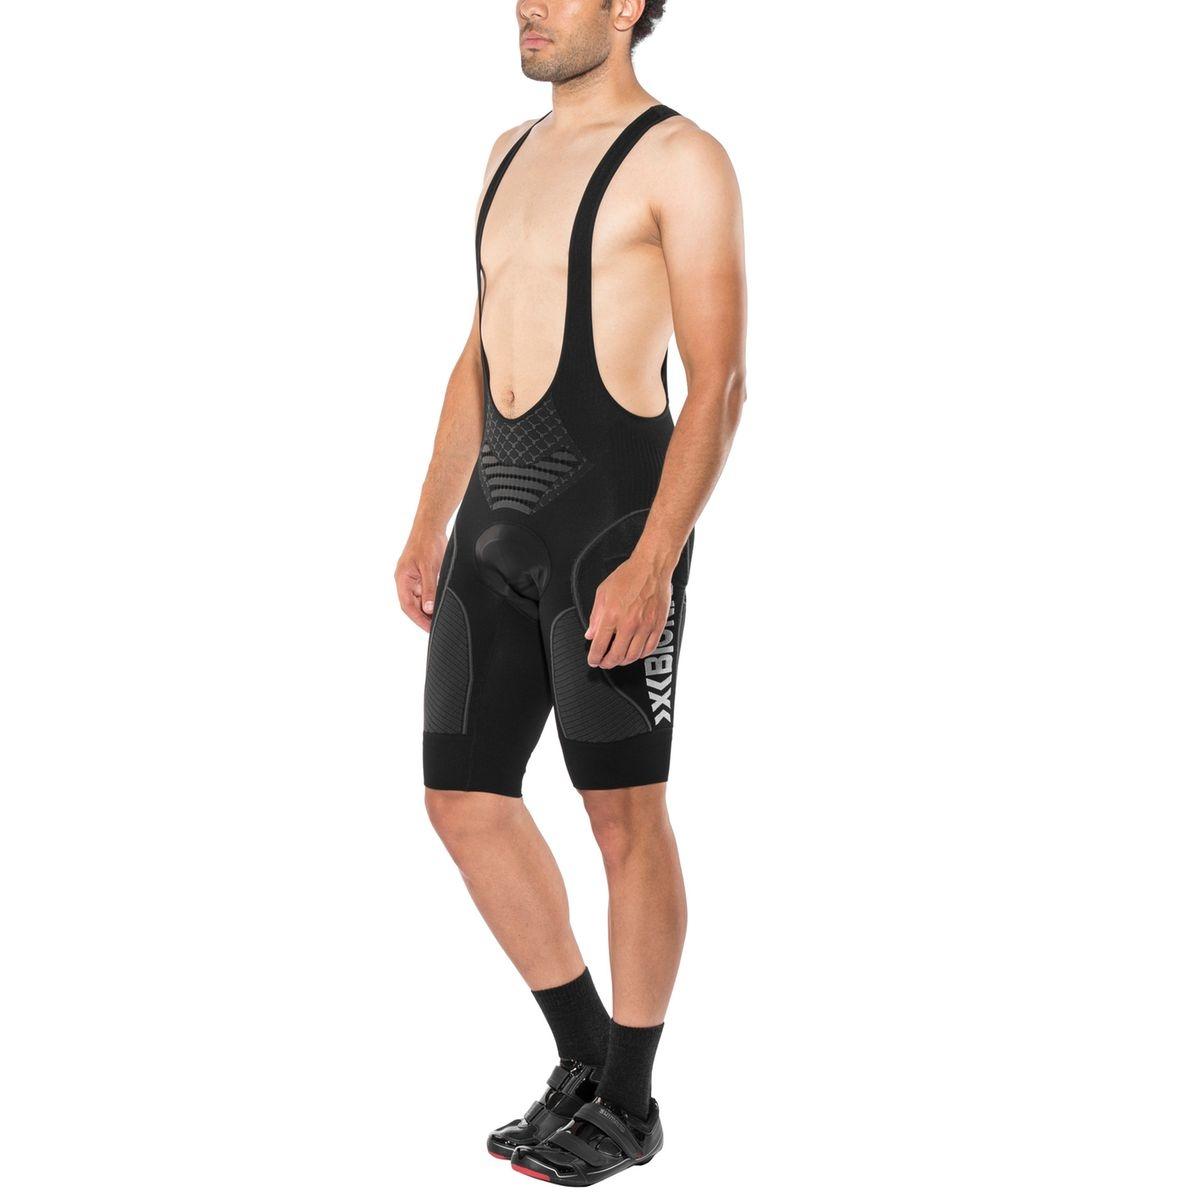 Biking TWYCE Endurance - Cuissard à bretelles Homme - gris/noir